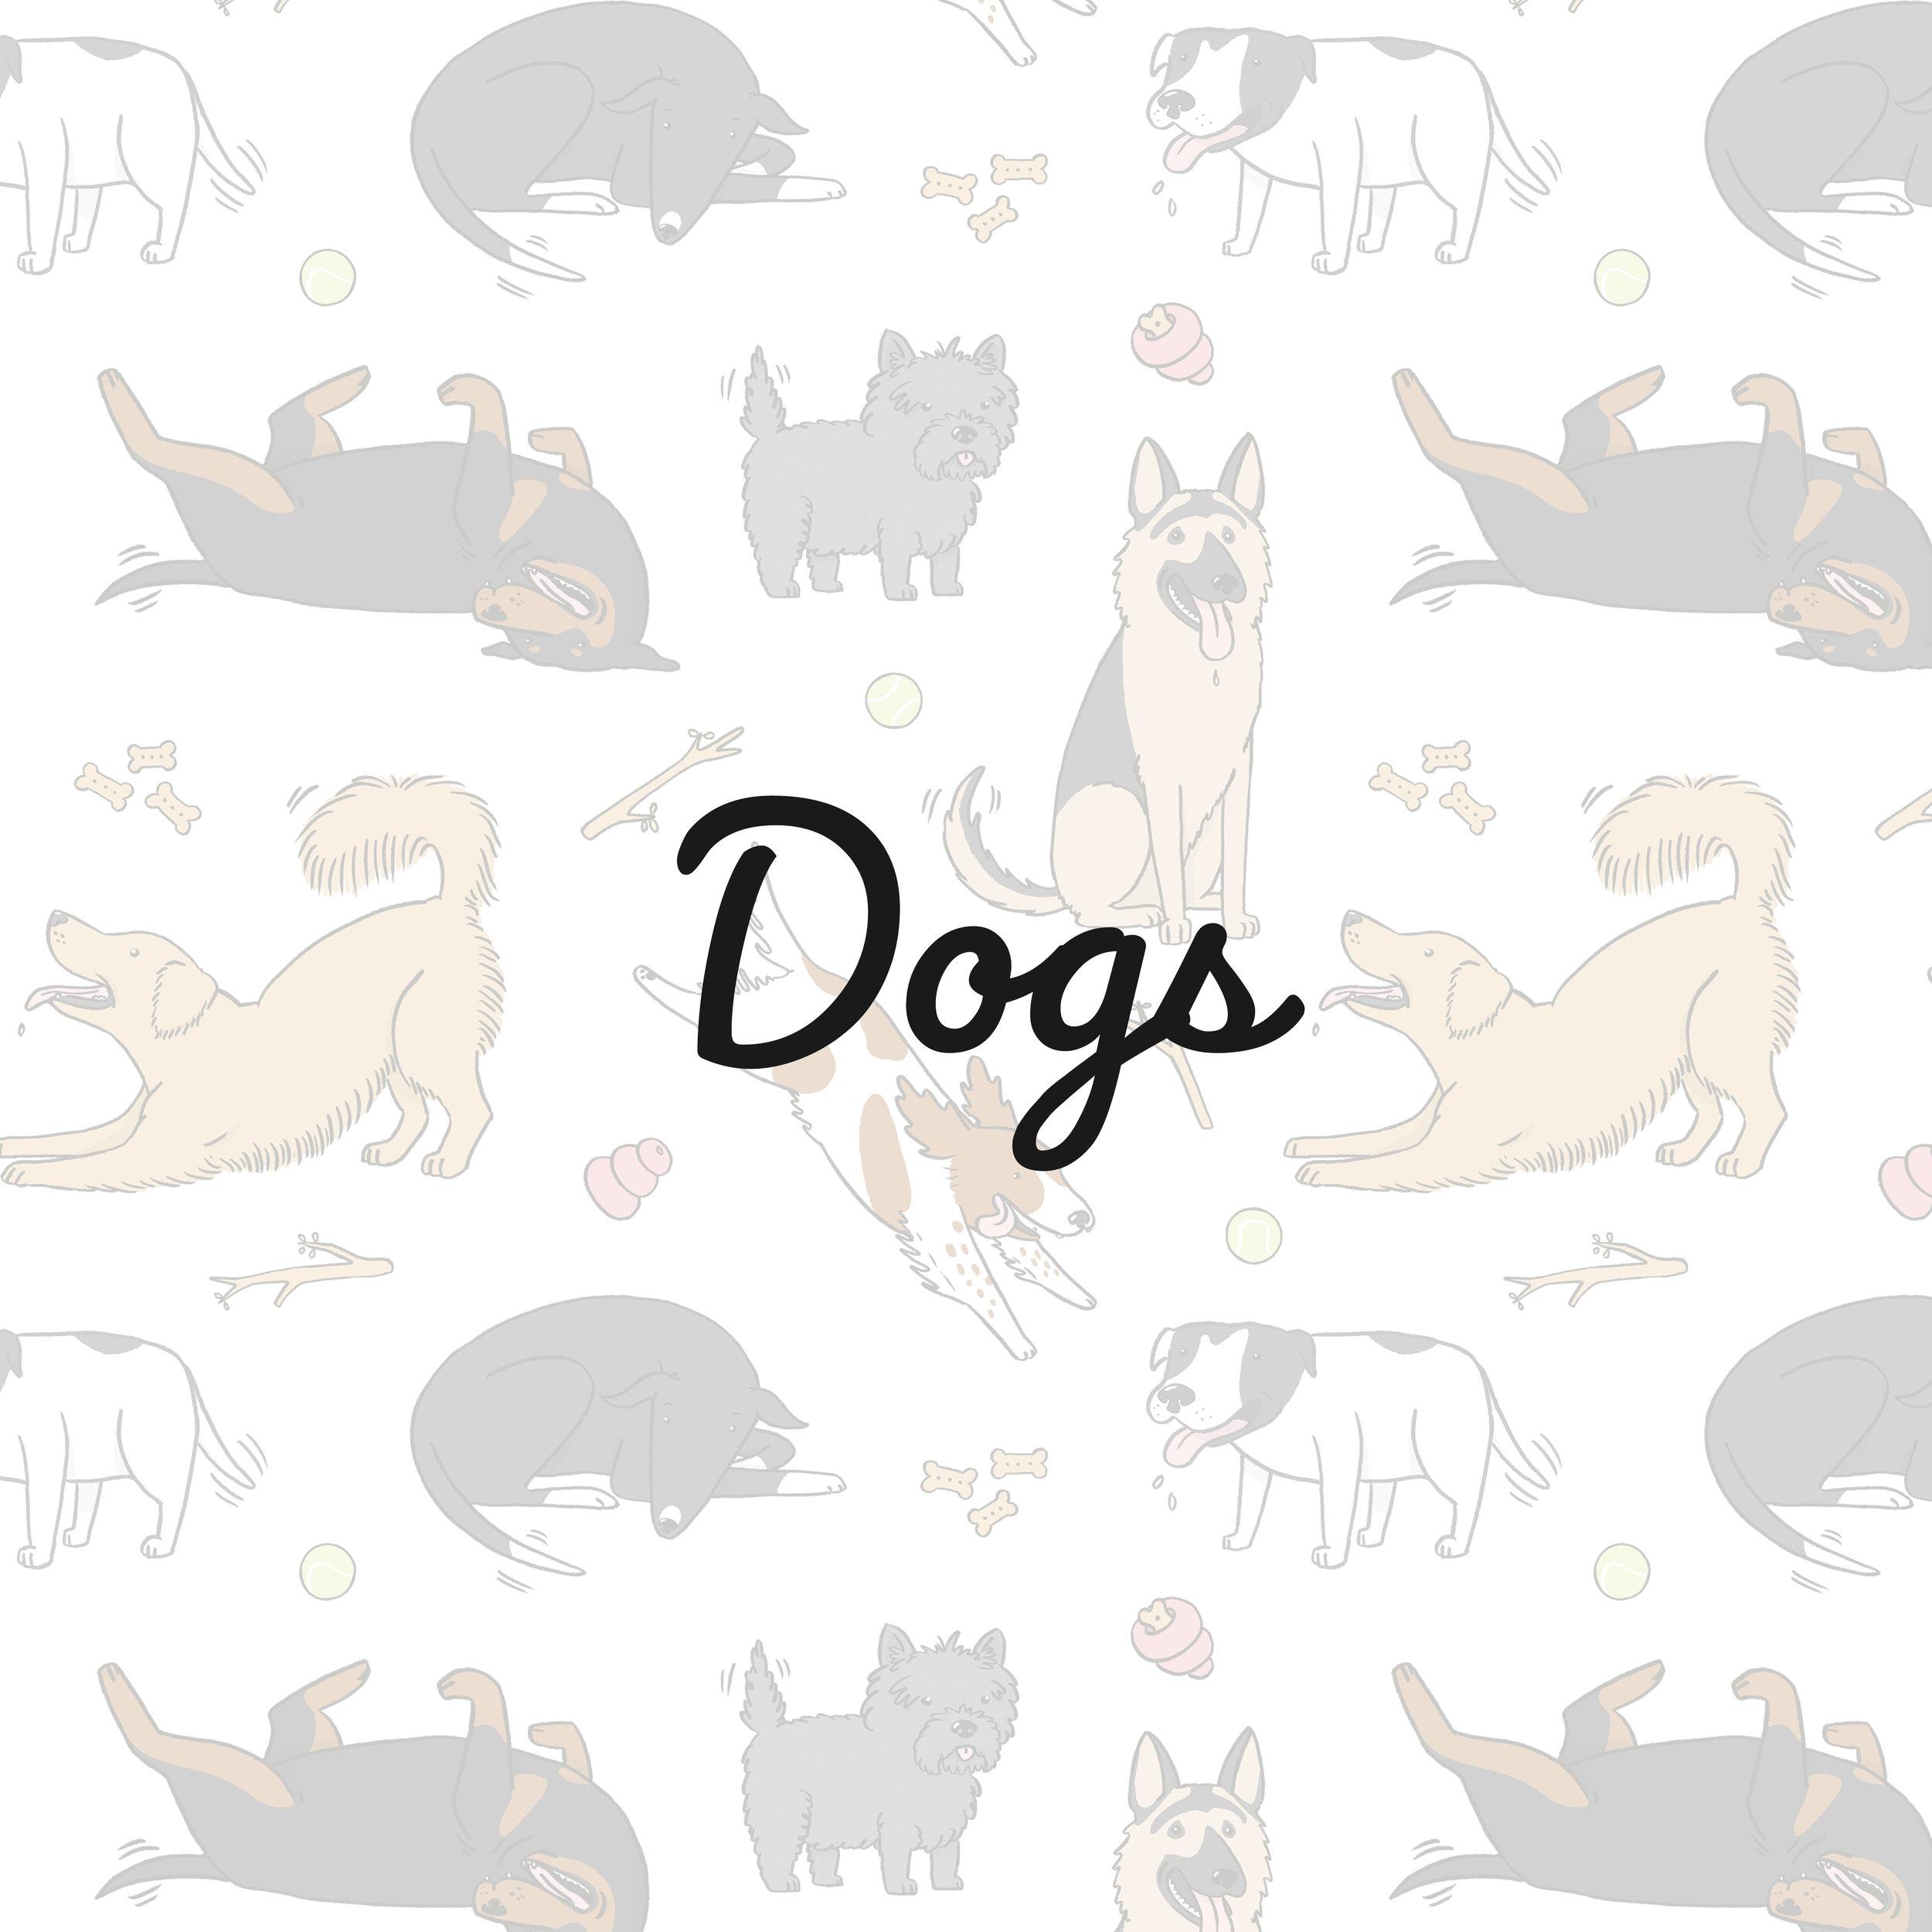 Dogs_square.jpg